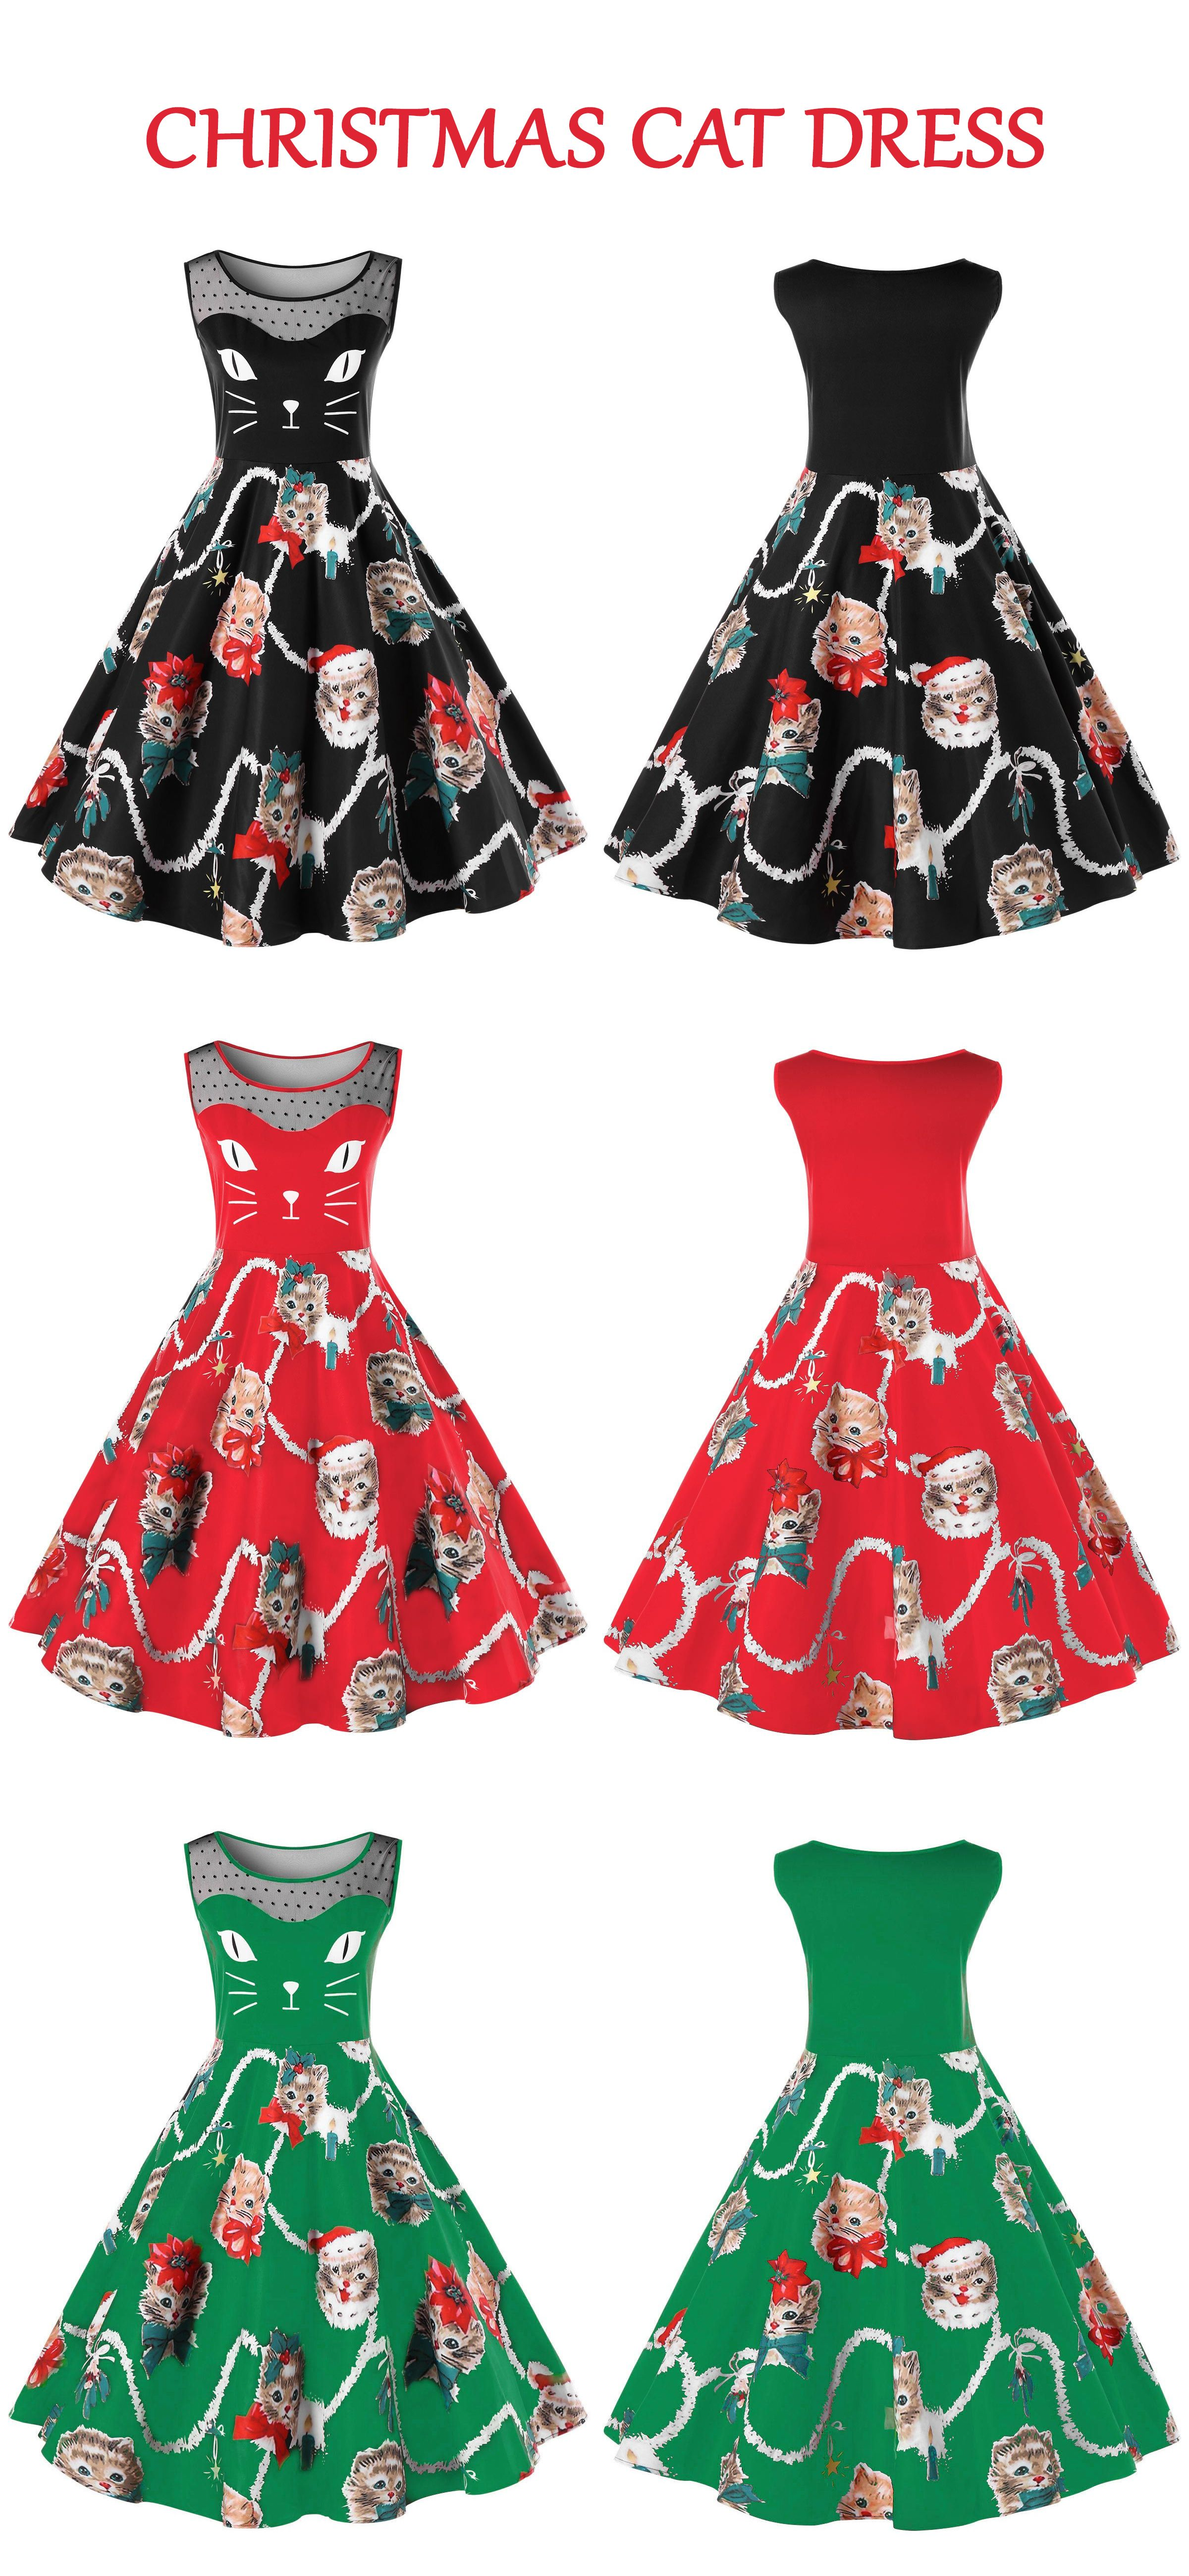 354cbb312ff4 $14.98,Christmas Plus Size Kitten Swing Dress-2XL | Rosewholesale,  Rosewholesale plus size, christmas dress, plus size, dress | #rosewholesale  #plussize ...